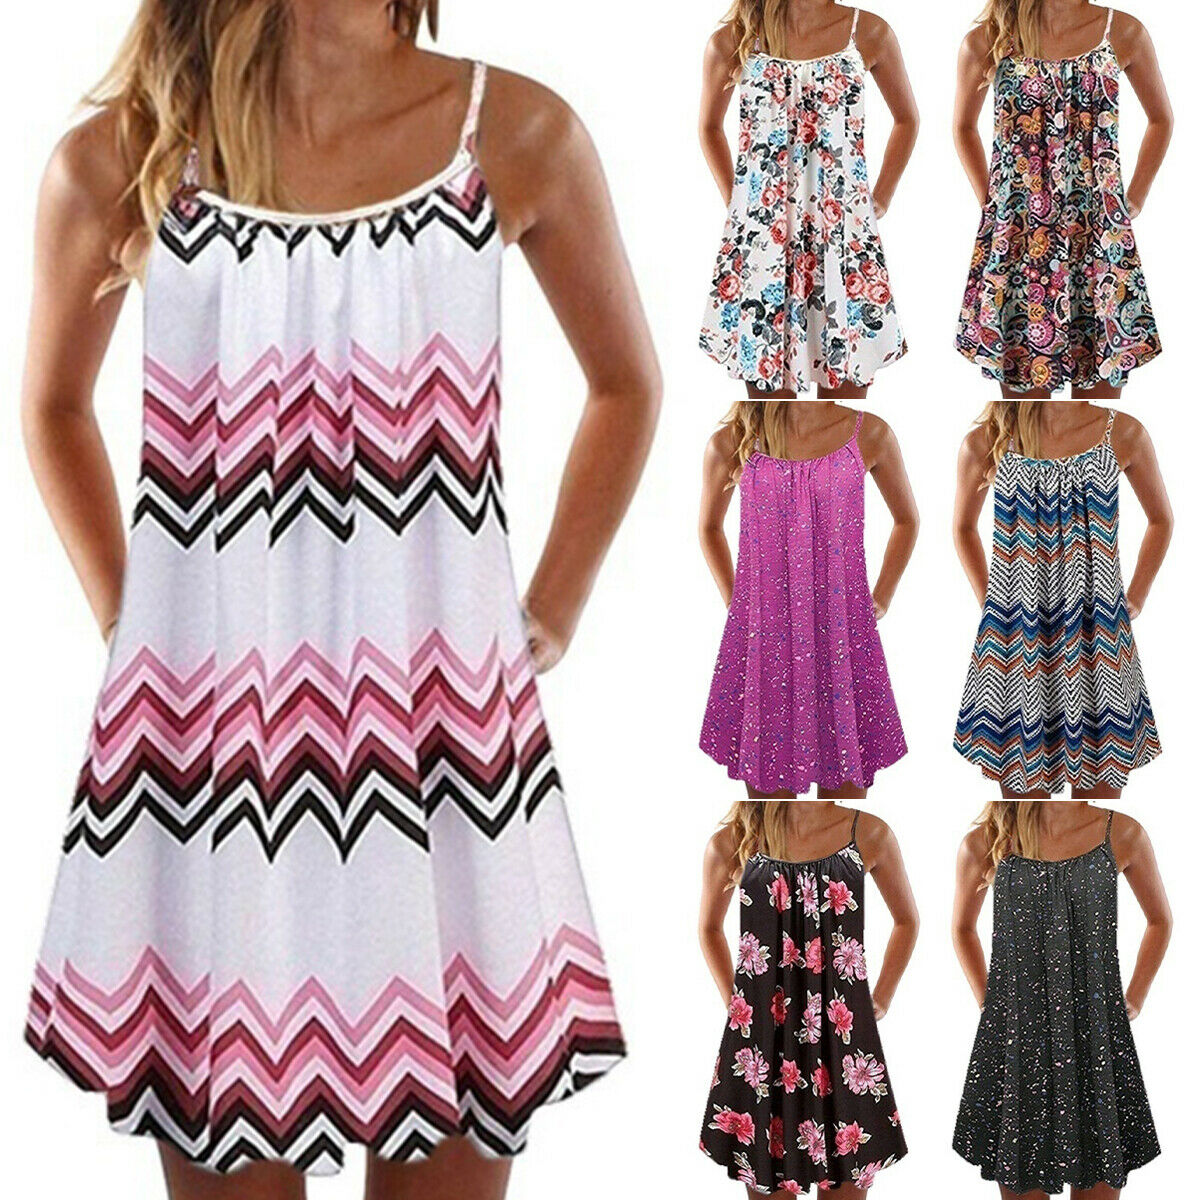 details zu damen boho minikleid sommer kleid baggy strandkleid lose  Ärmellos trägerkleid de